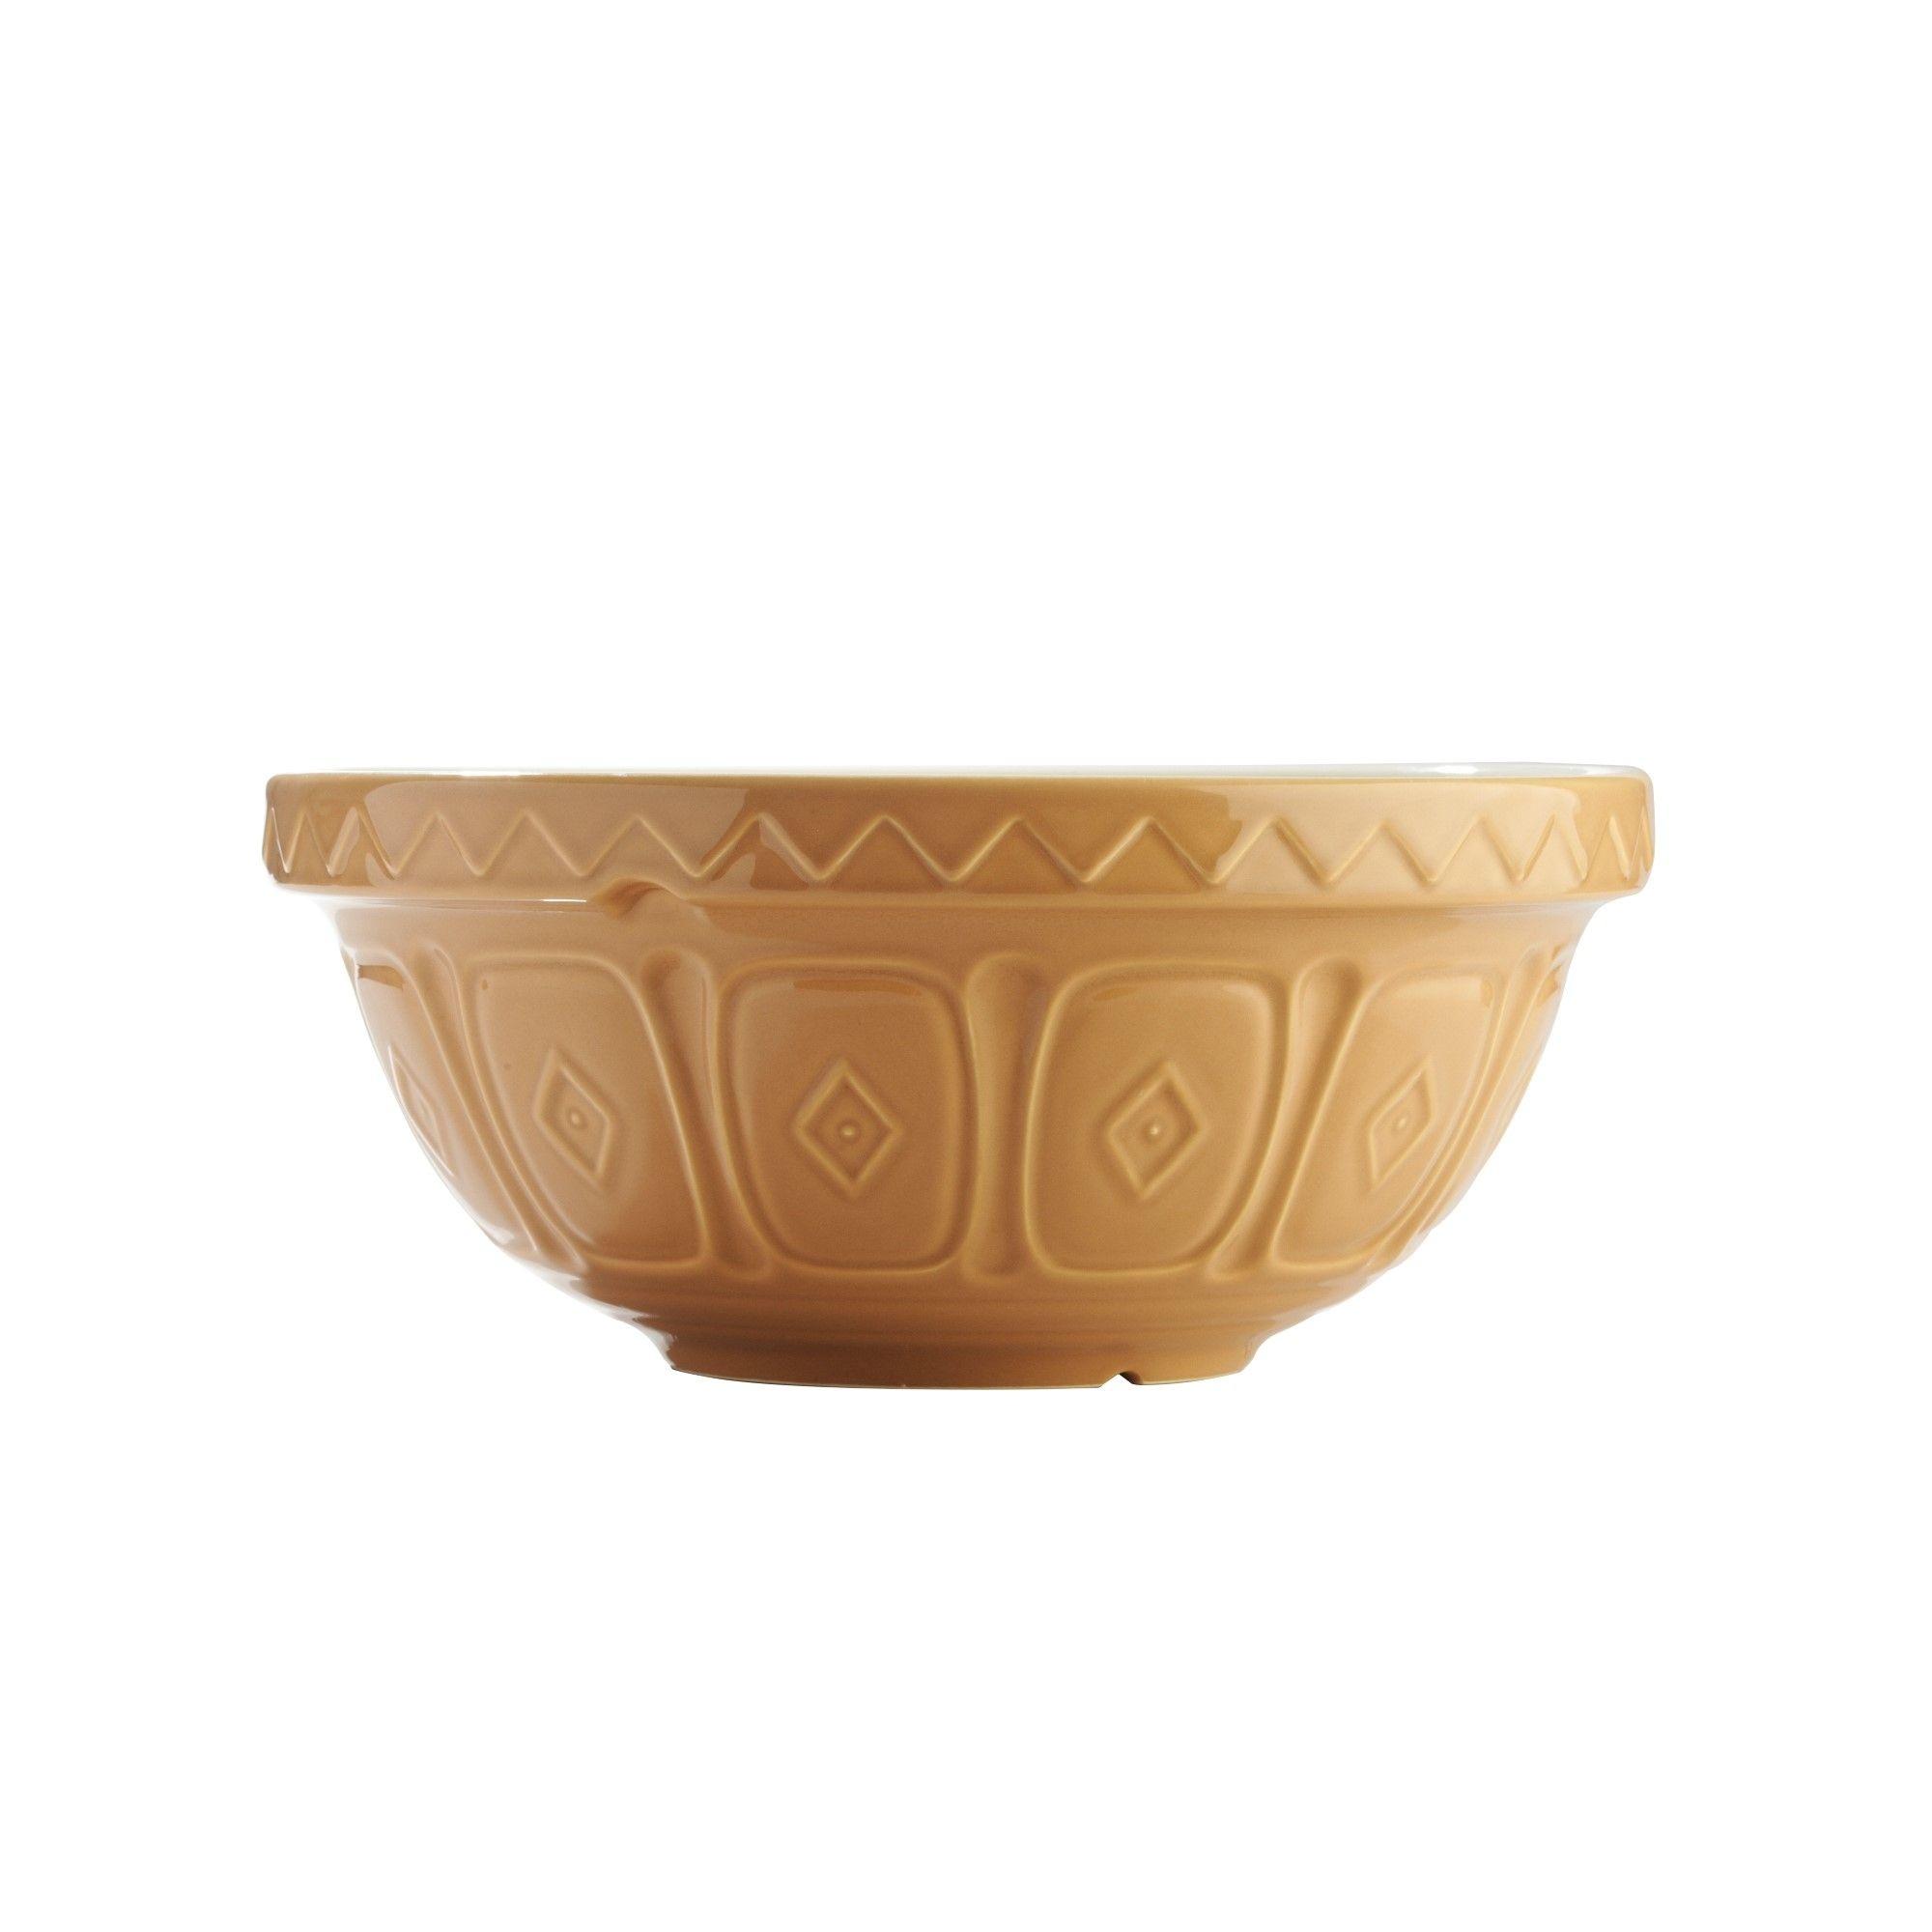 "CANE Mixing Bowl - 24cm/9.5"""